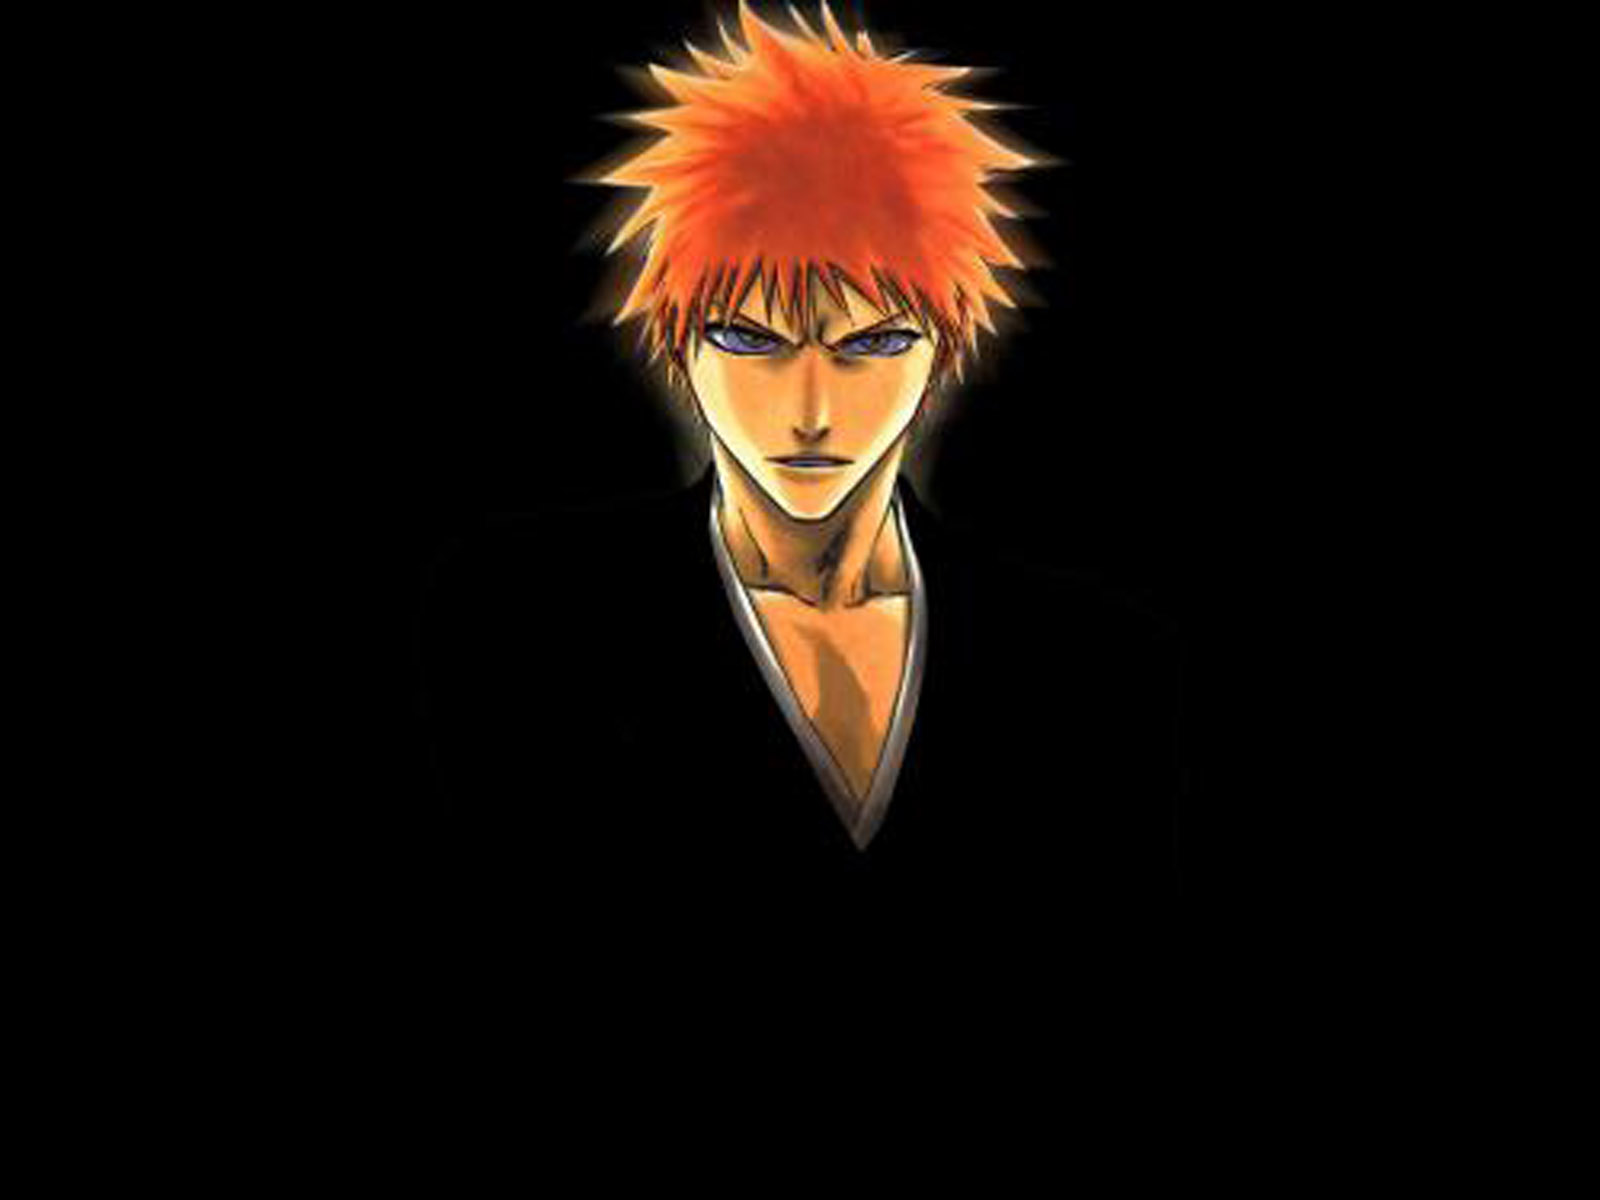 Anime Guy Cool Wallpapers Cool Anime Guy Desktop Backgrounds Anime 1600x1200